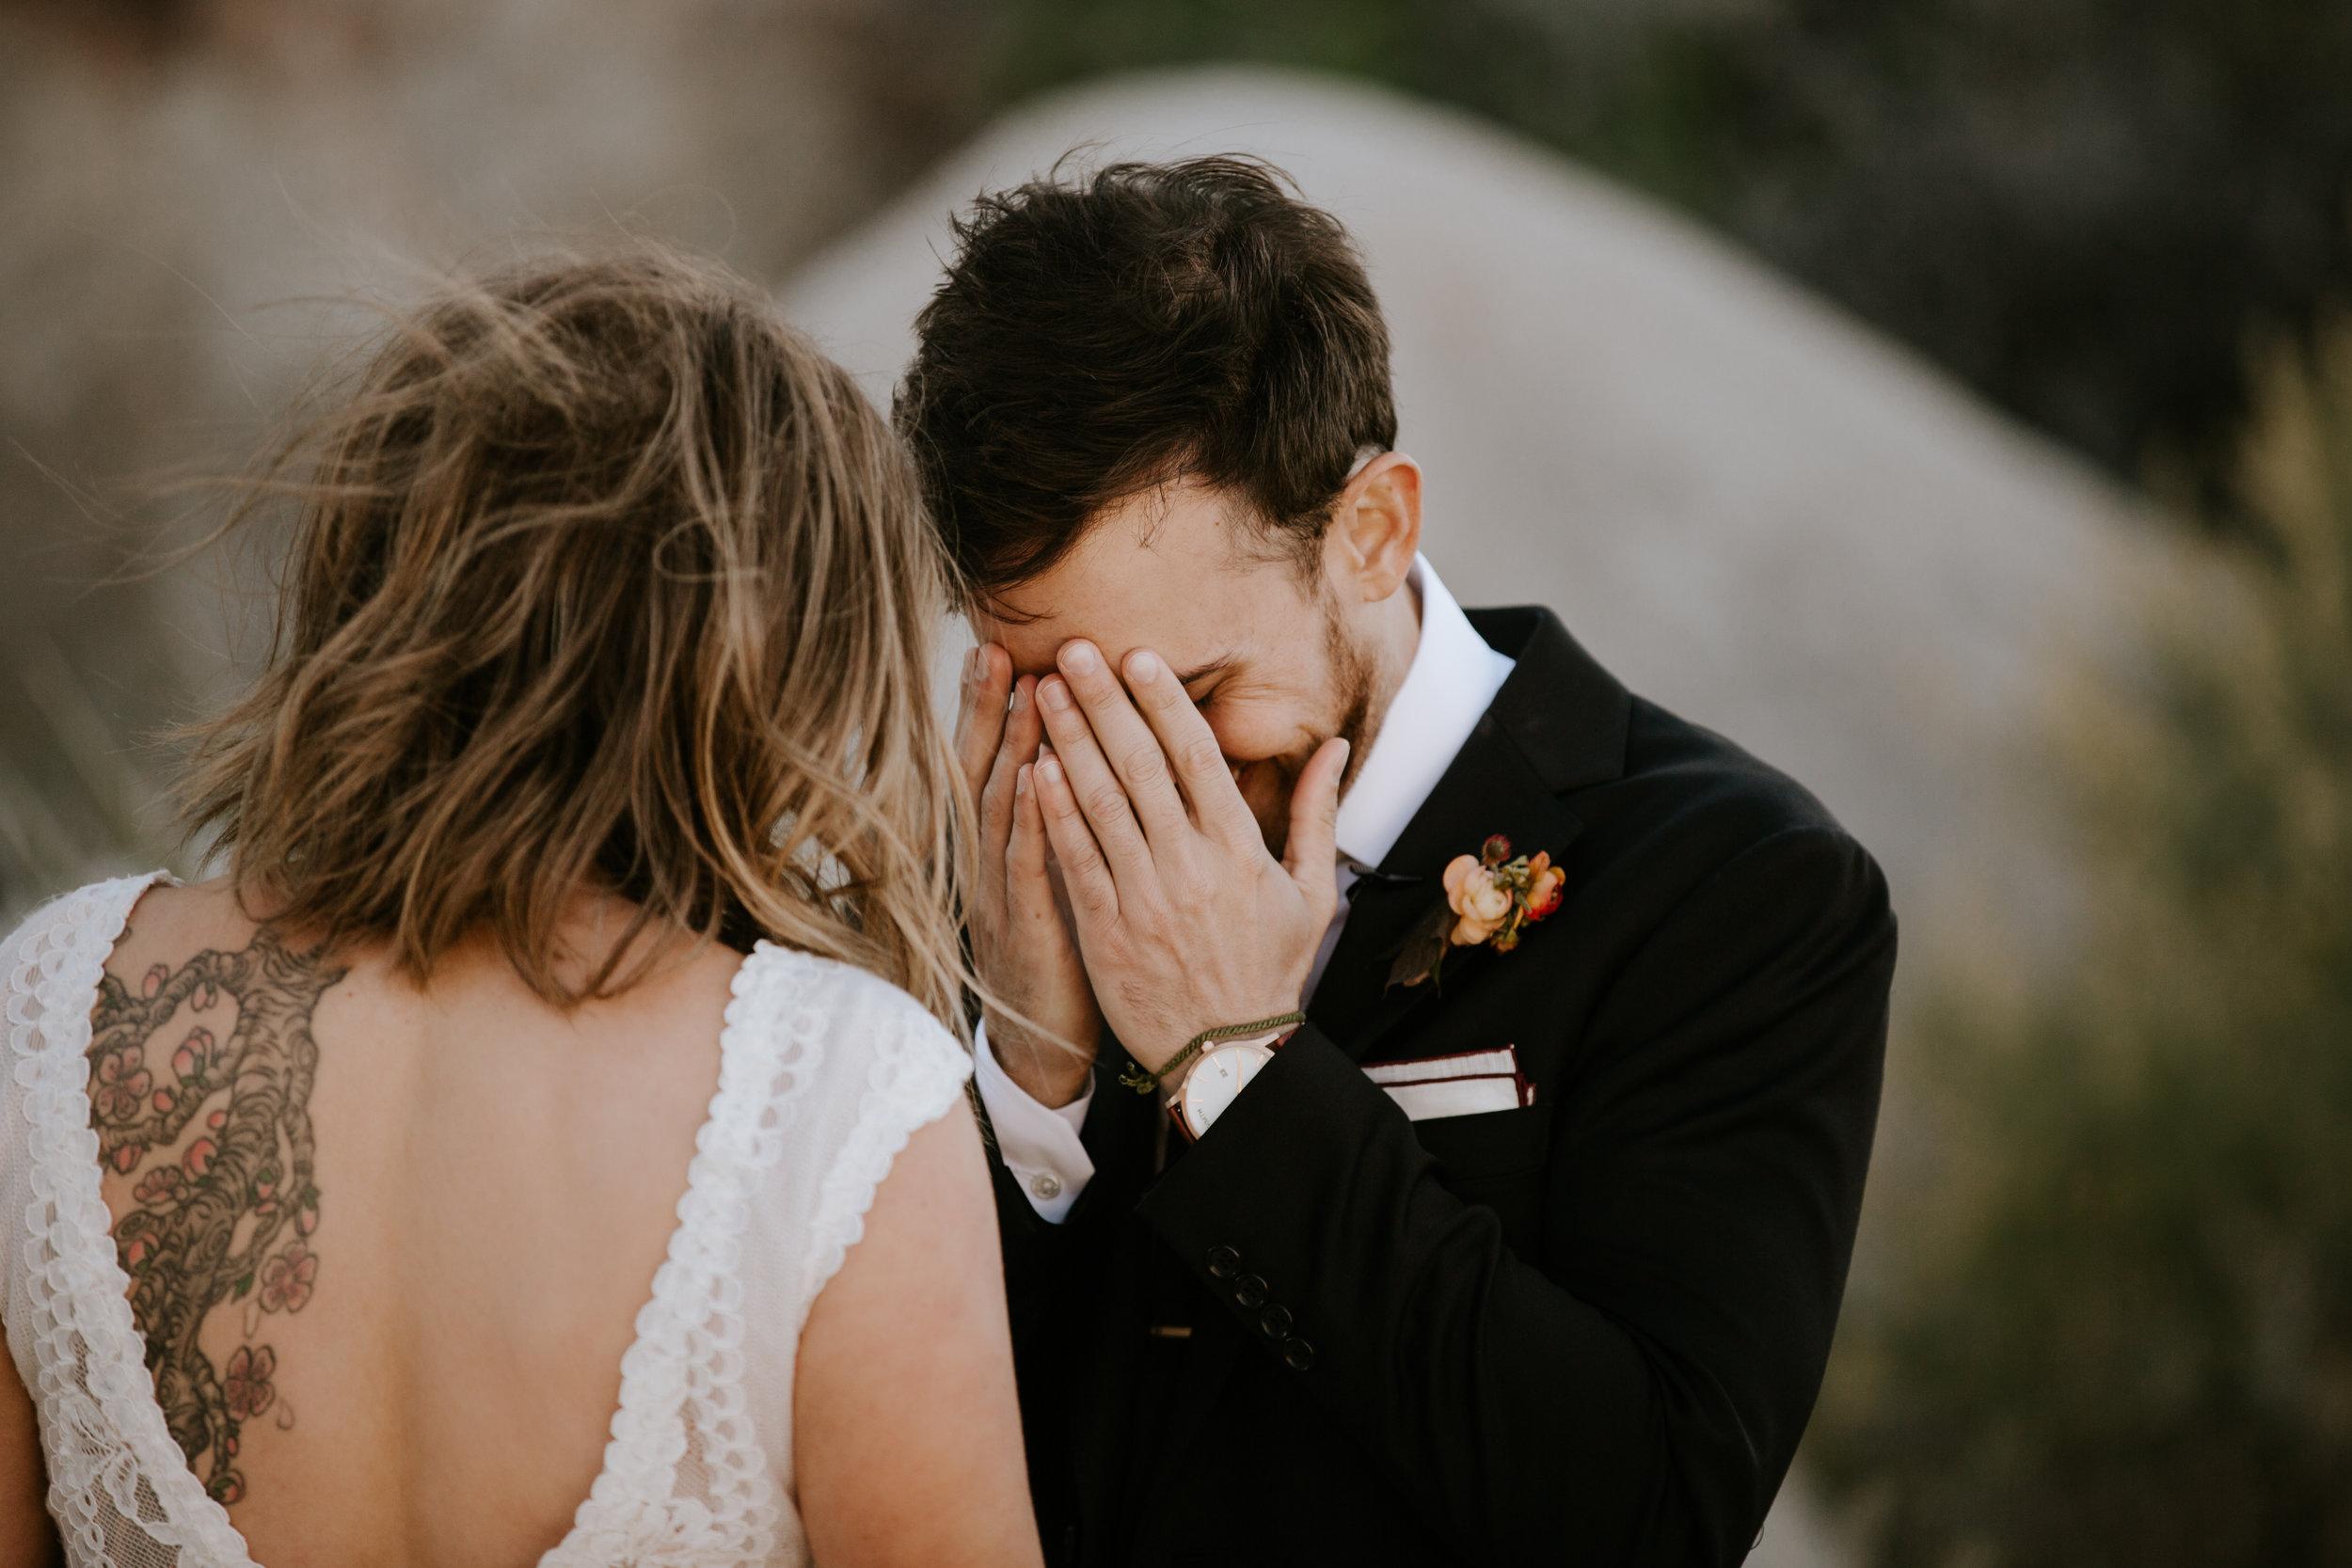 2019-05-26_Callie-Evan_Wedding_Joshua Tree_Paige Nelson_PREVIEWS HR-33.jpg